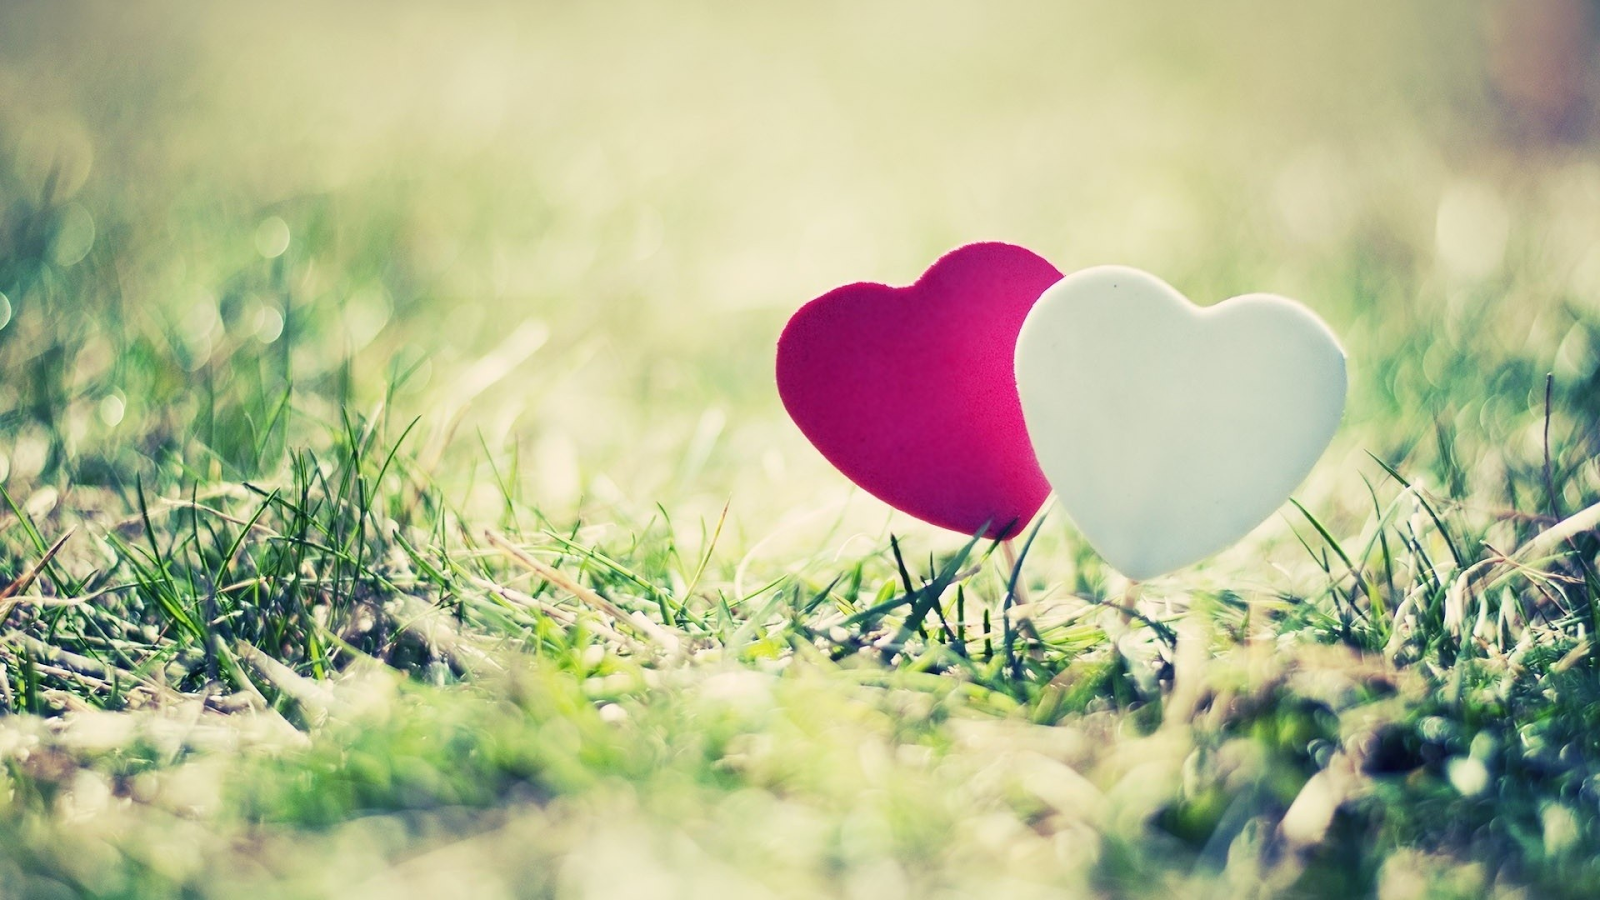 Wallpaper download hd love 2016 - Love Images Wallpaper Screenshot